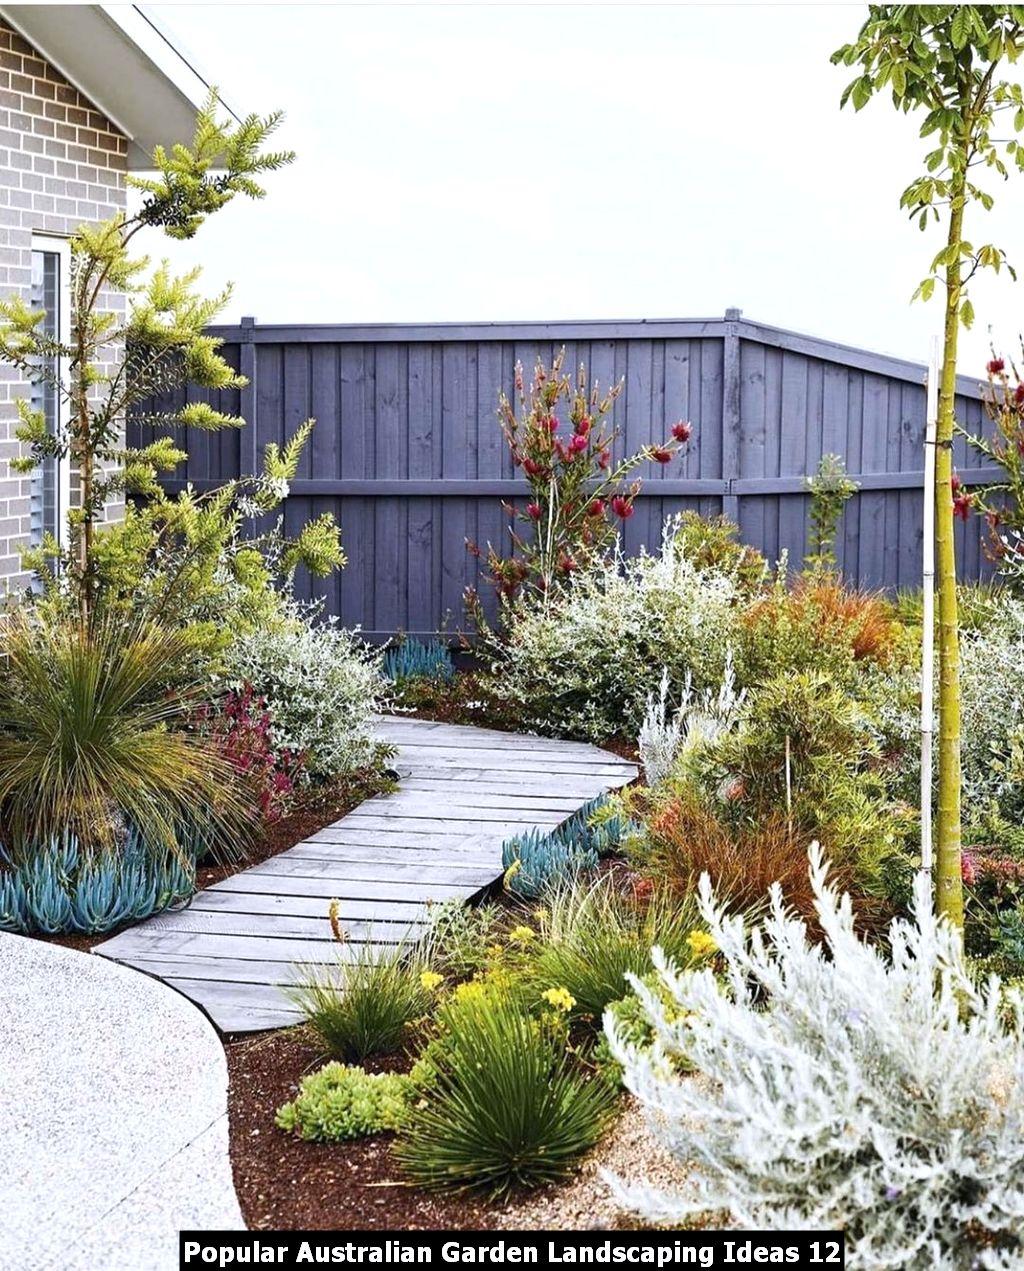 Popular Australian Garden Landscaping Ideas 12